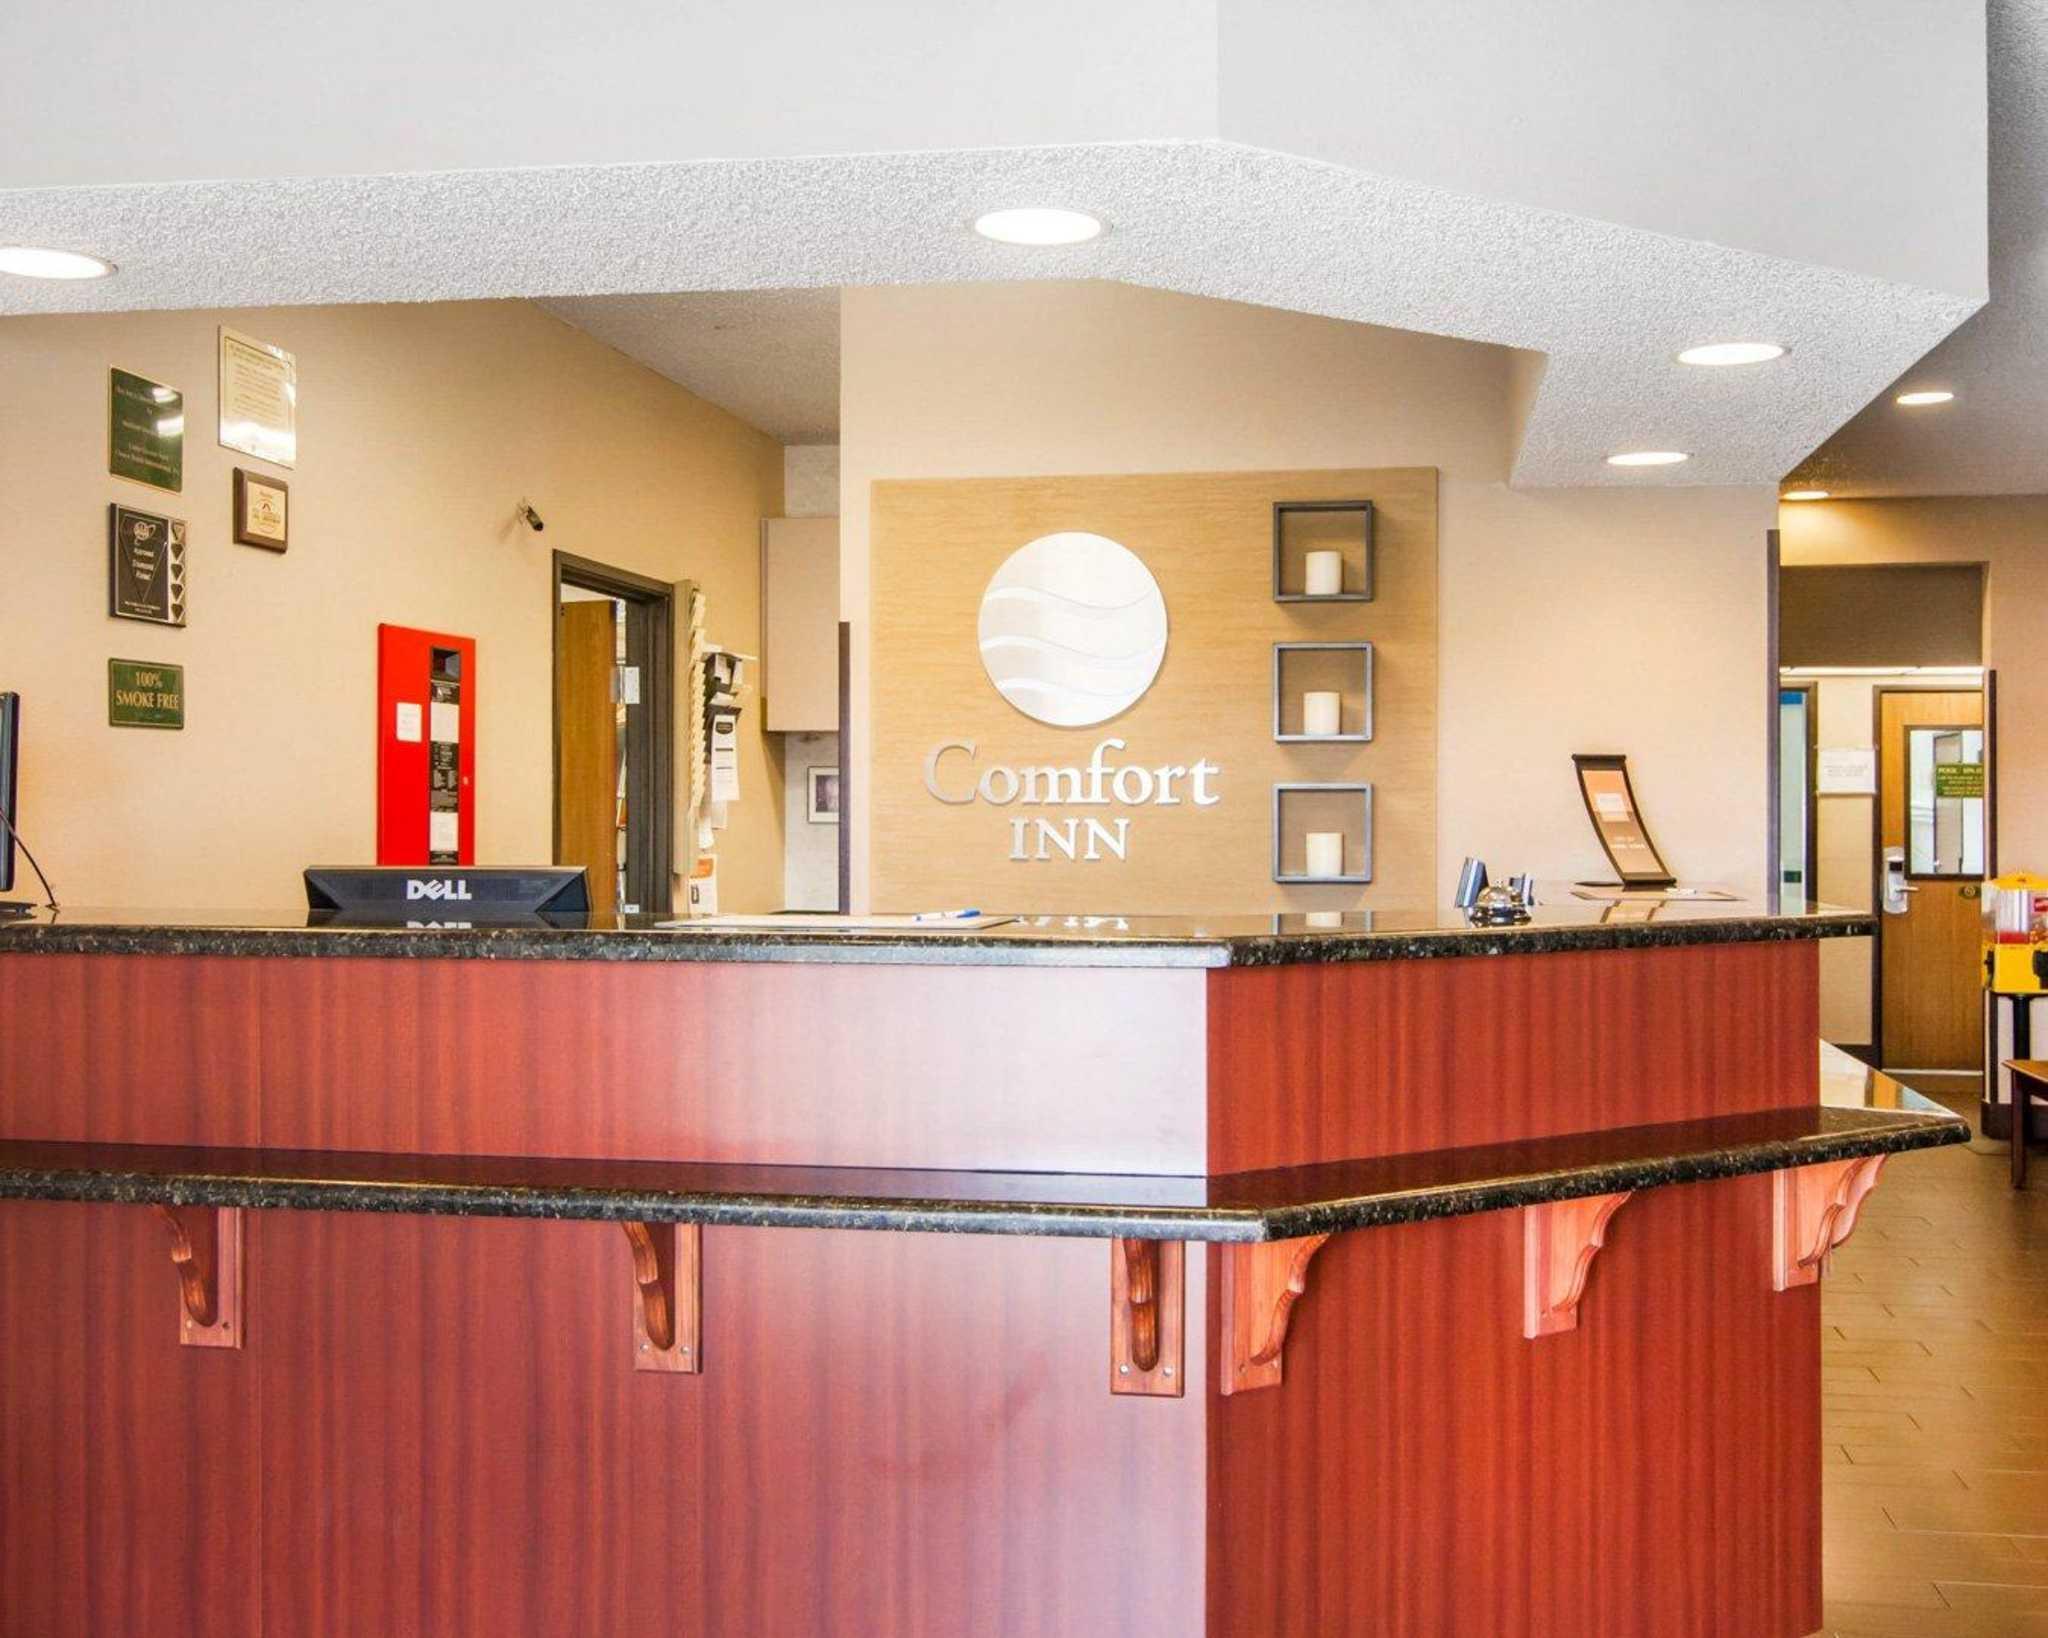 Comfort Inn North image 17